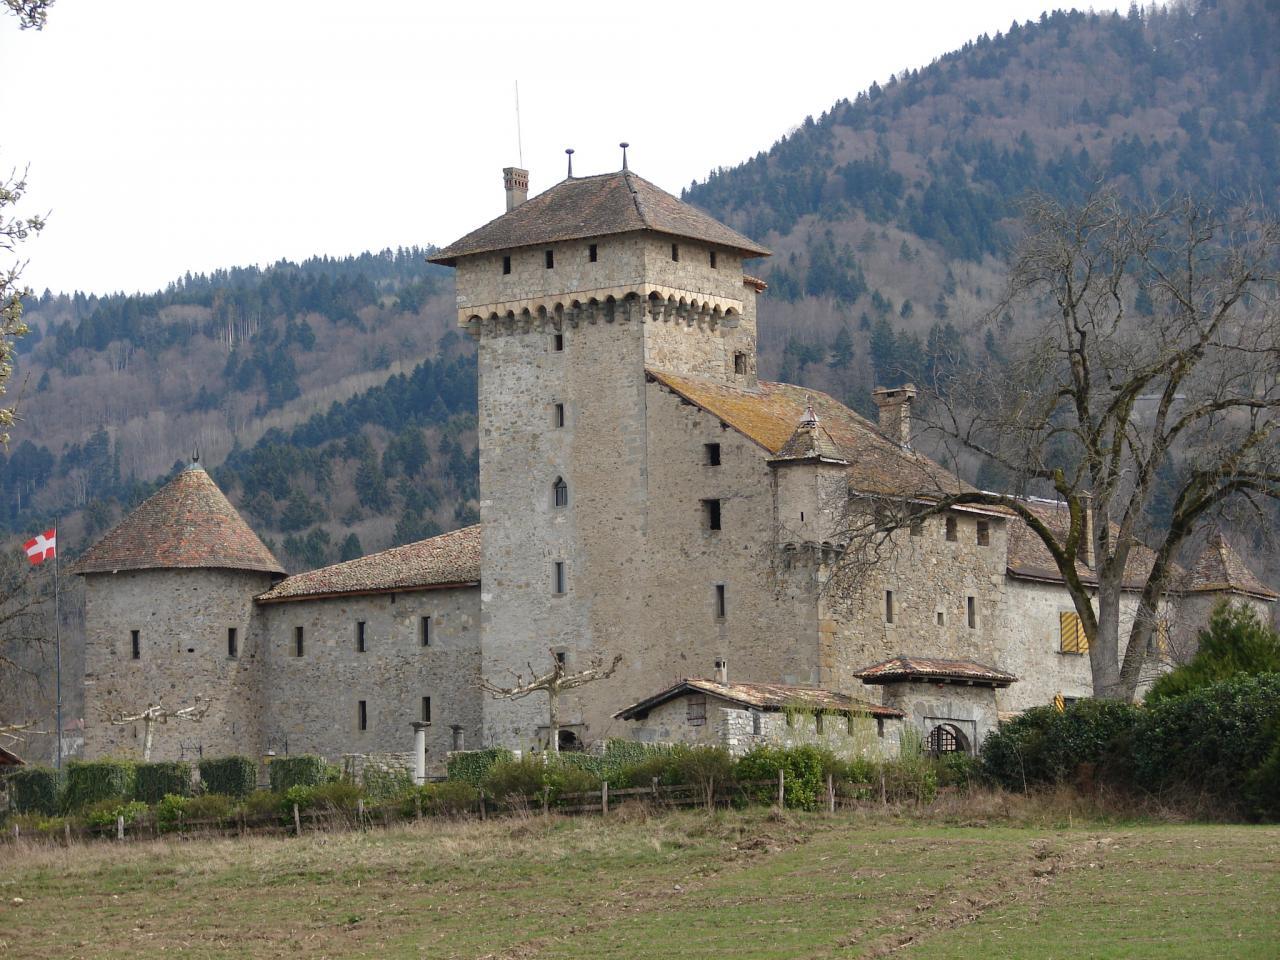 Le chateau d'Avully